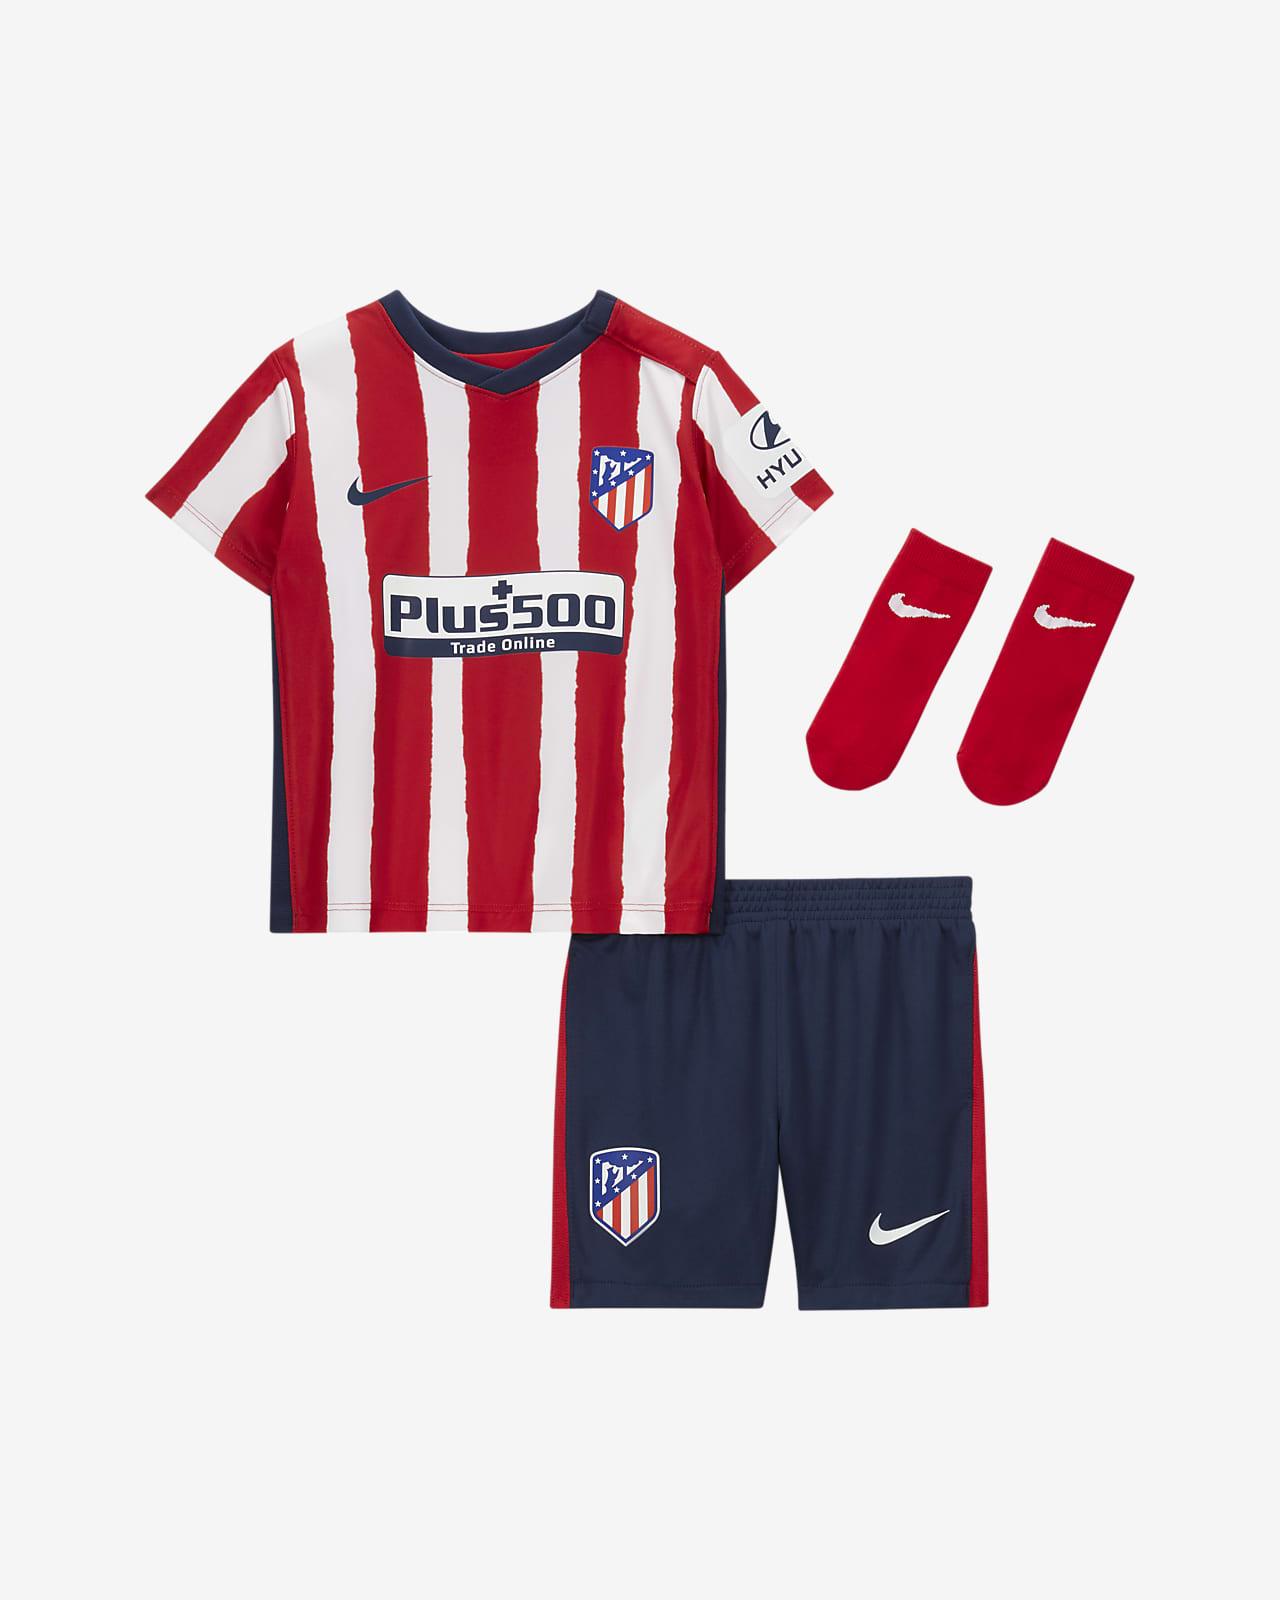 Atlético de Madrid 2020/21 Home Bebek Futbol Forması